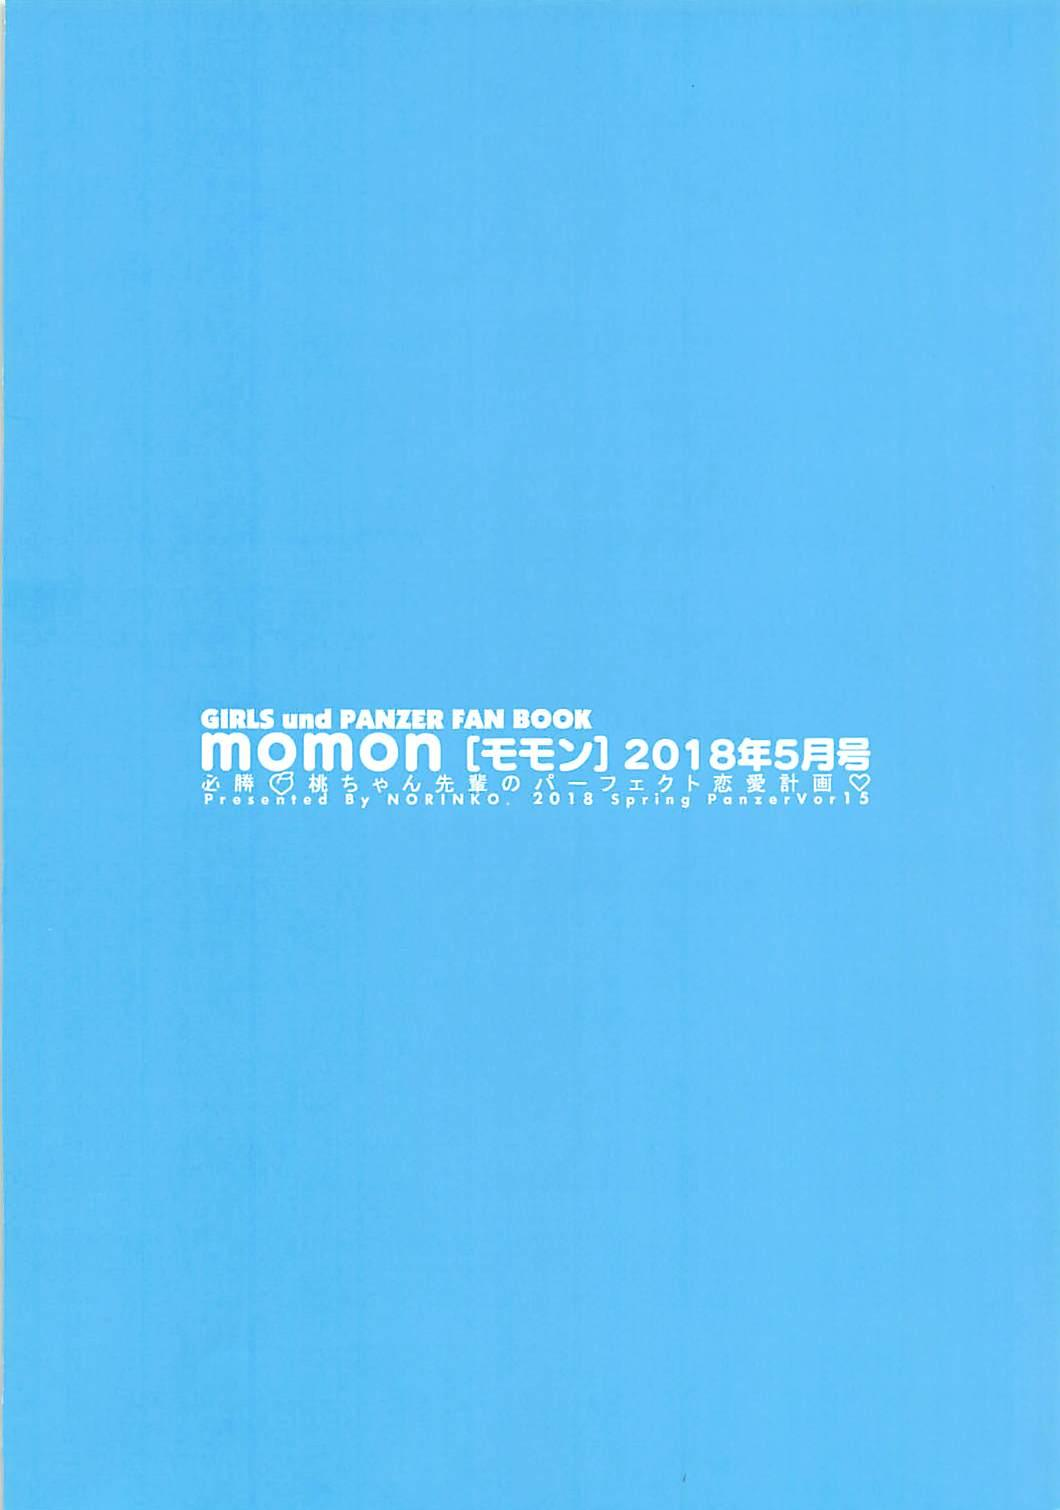 (Panzer Vor! 15) [Norinko] momon 2018-05 Hisshou Momo-chan Senpai no Perfect Date Plan (Girls und Panzer) 18